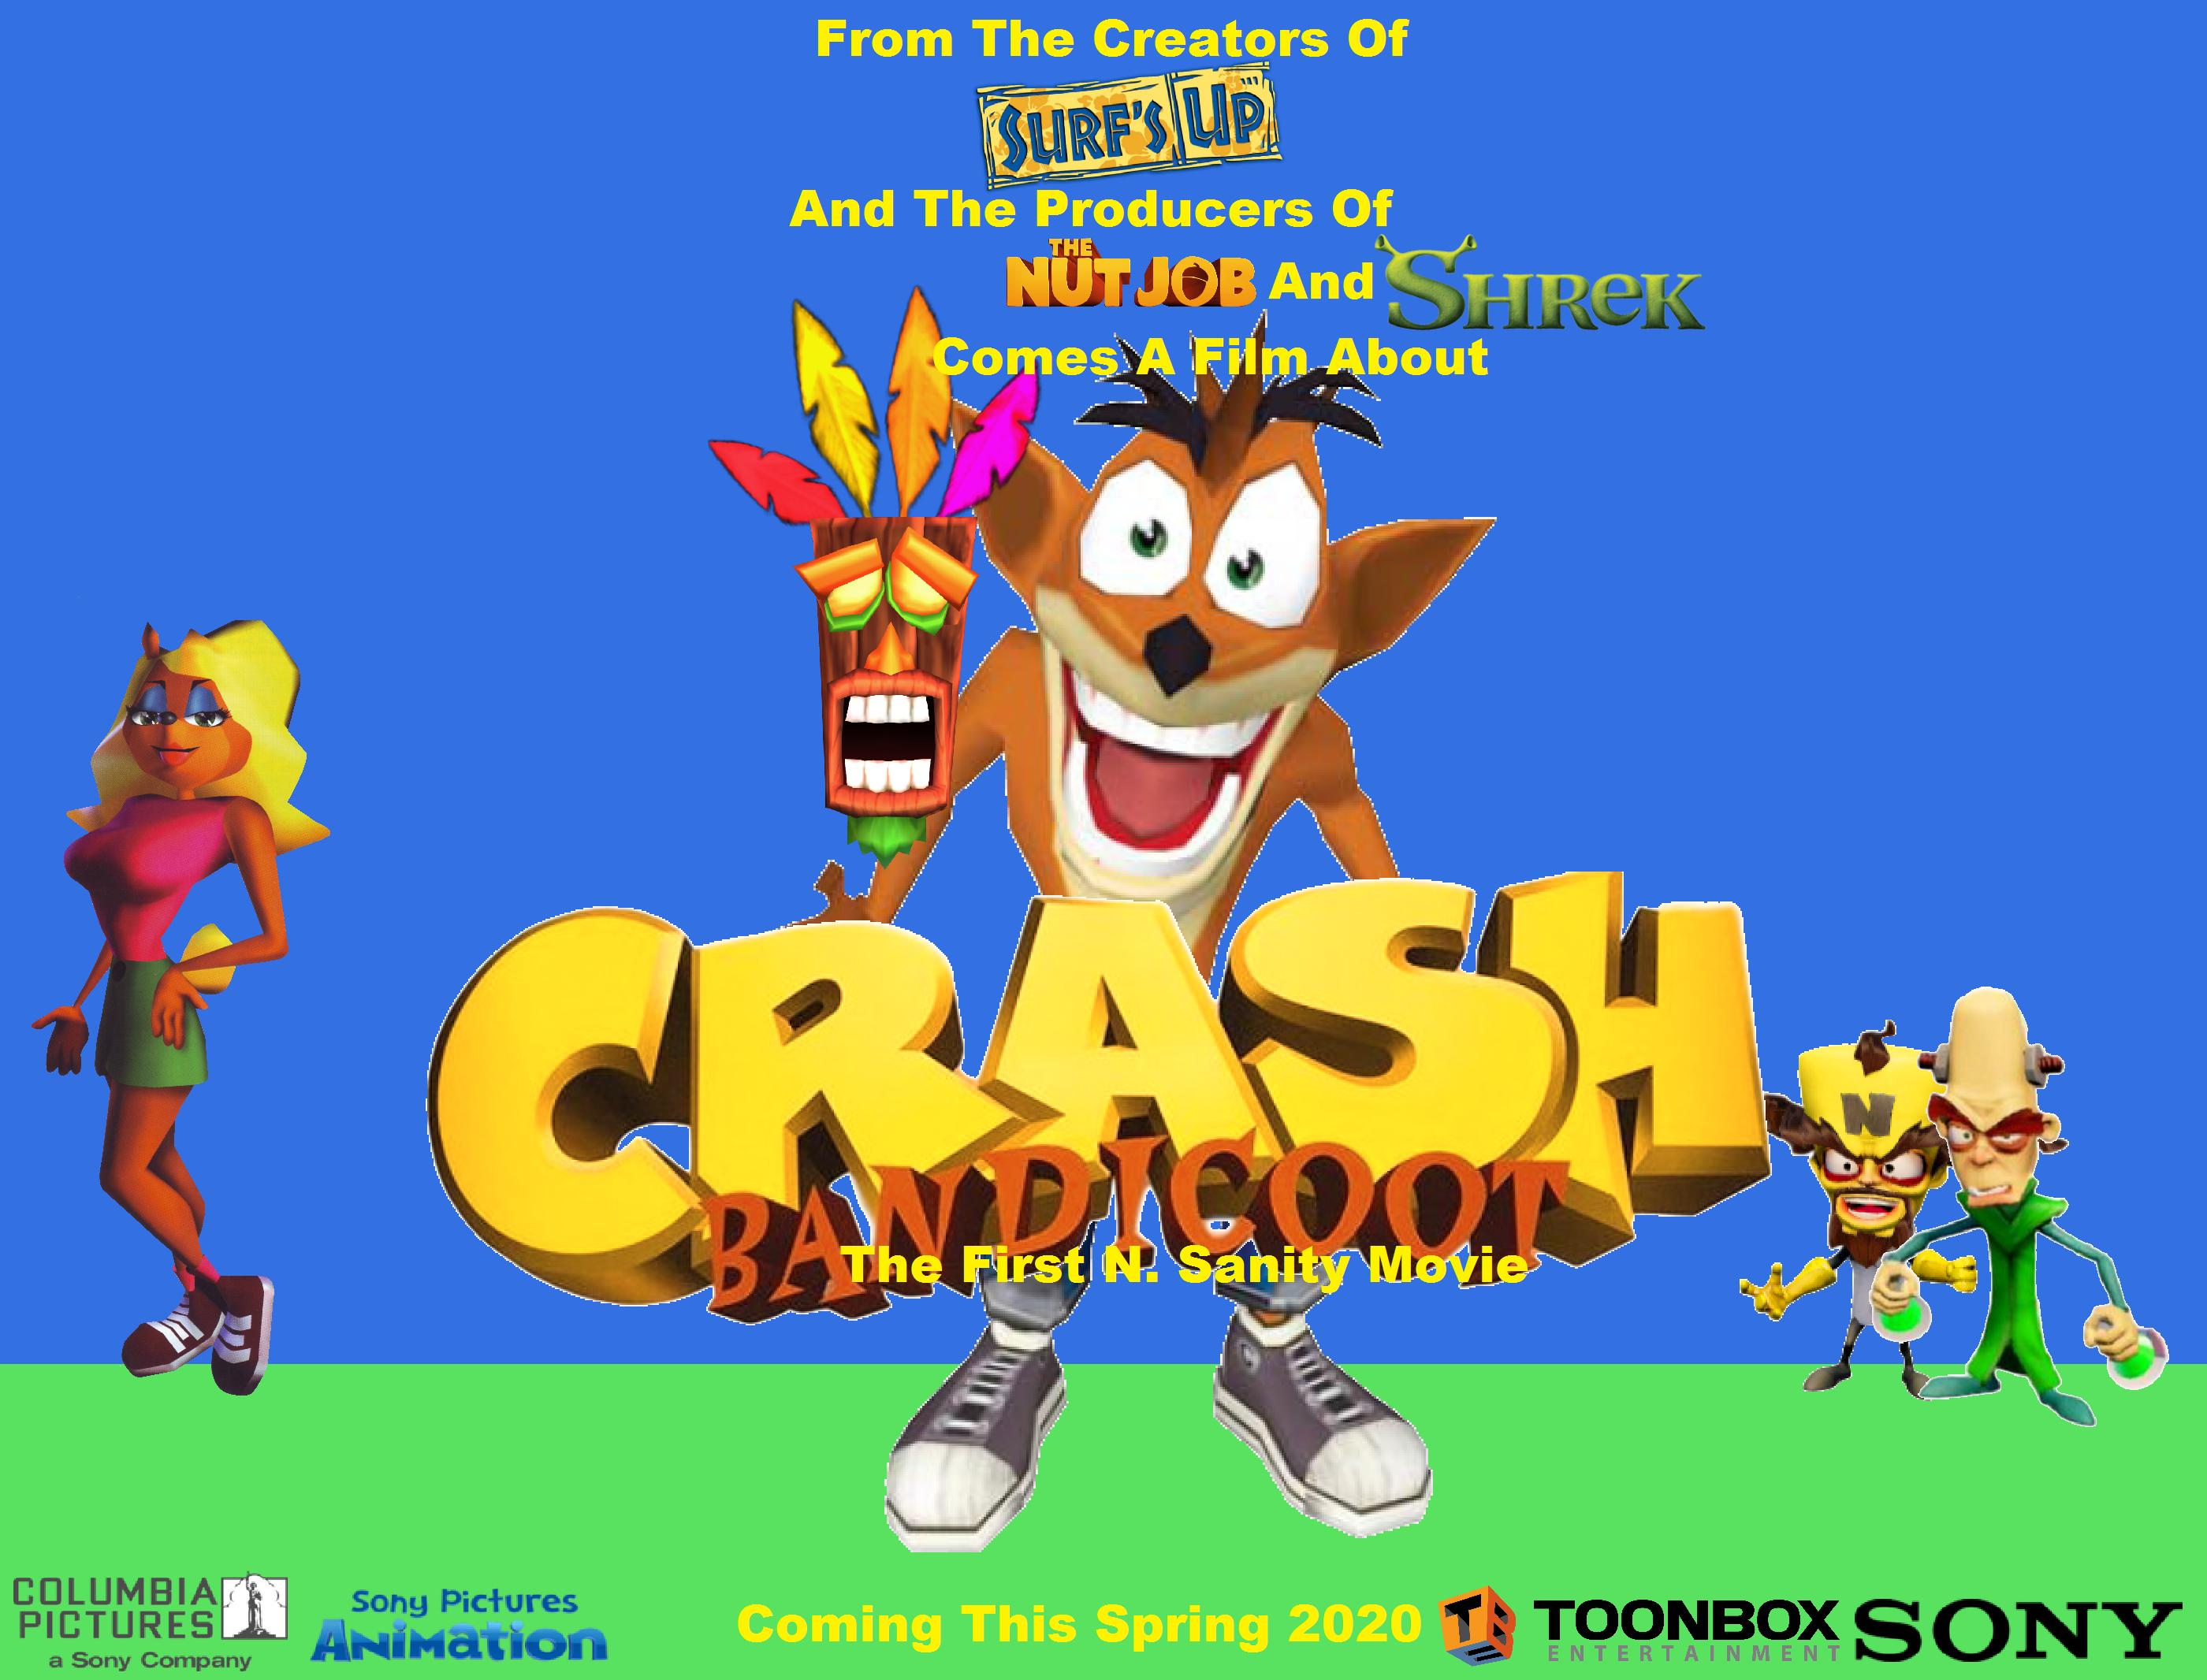 crash bandicoot the first n sanity movie 2020 film idea wiki